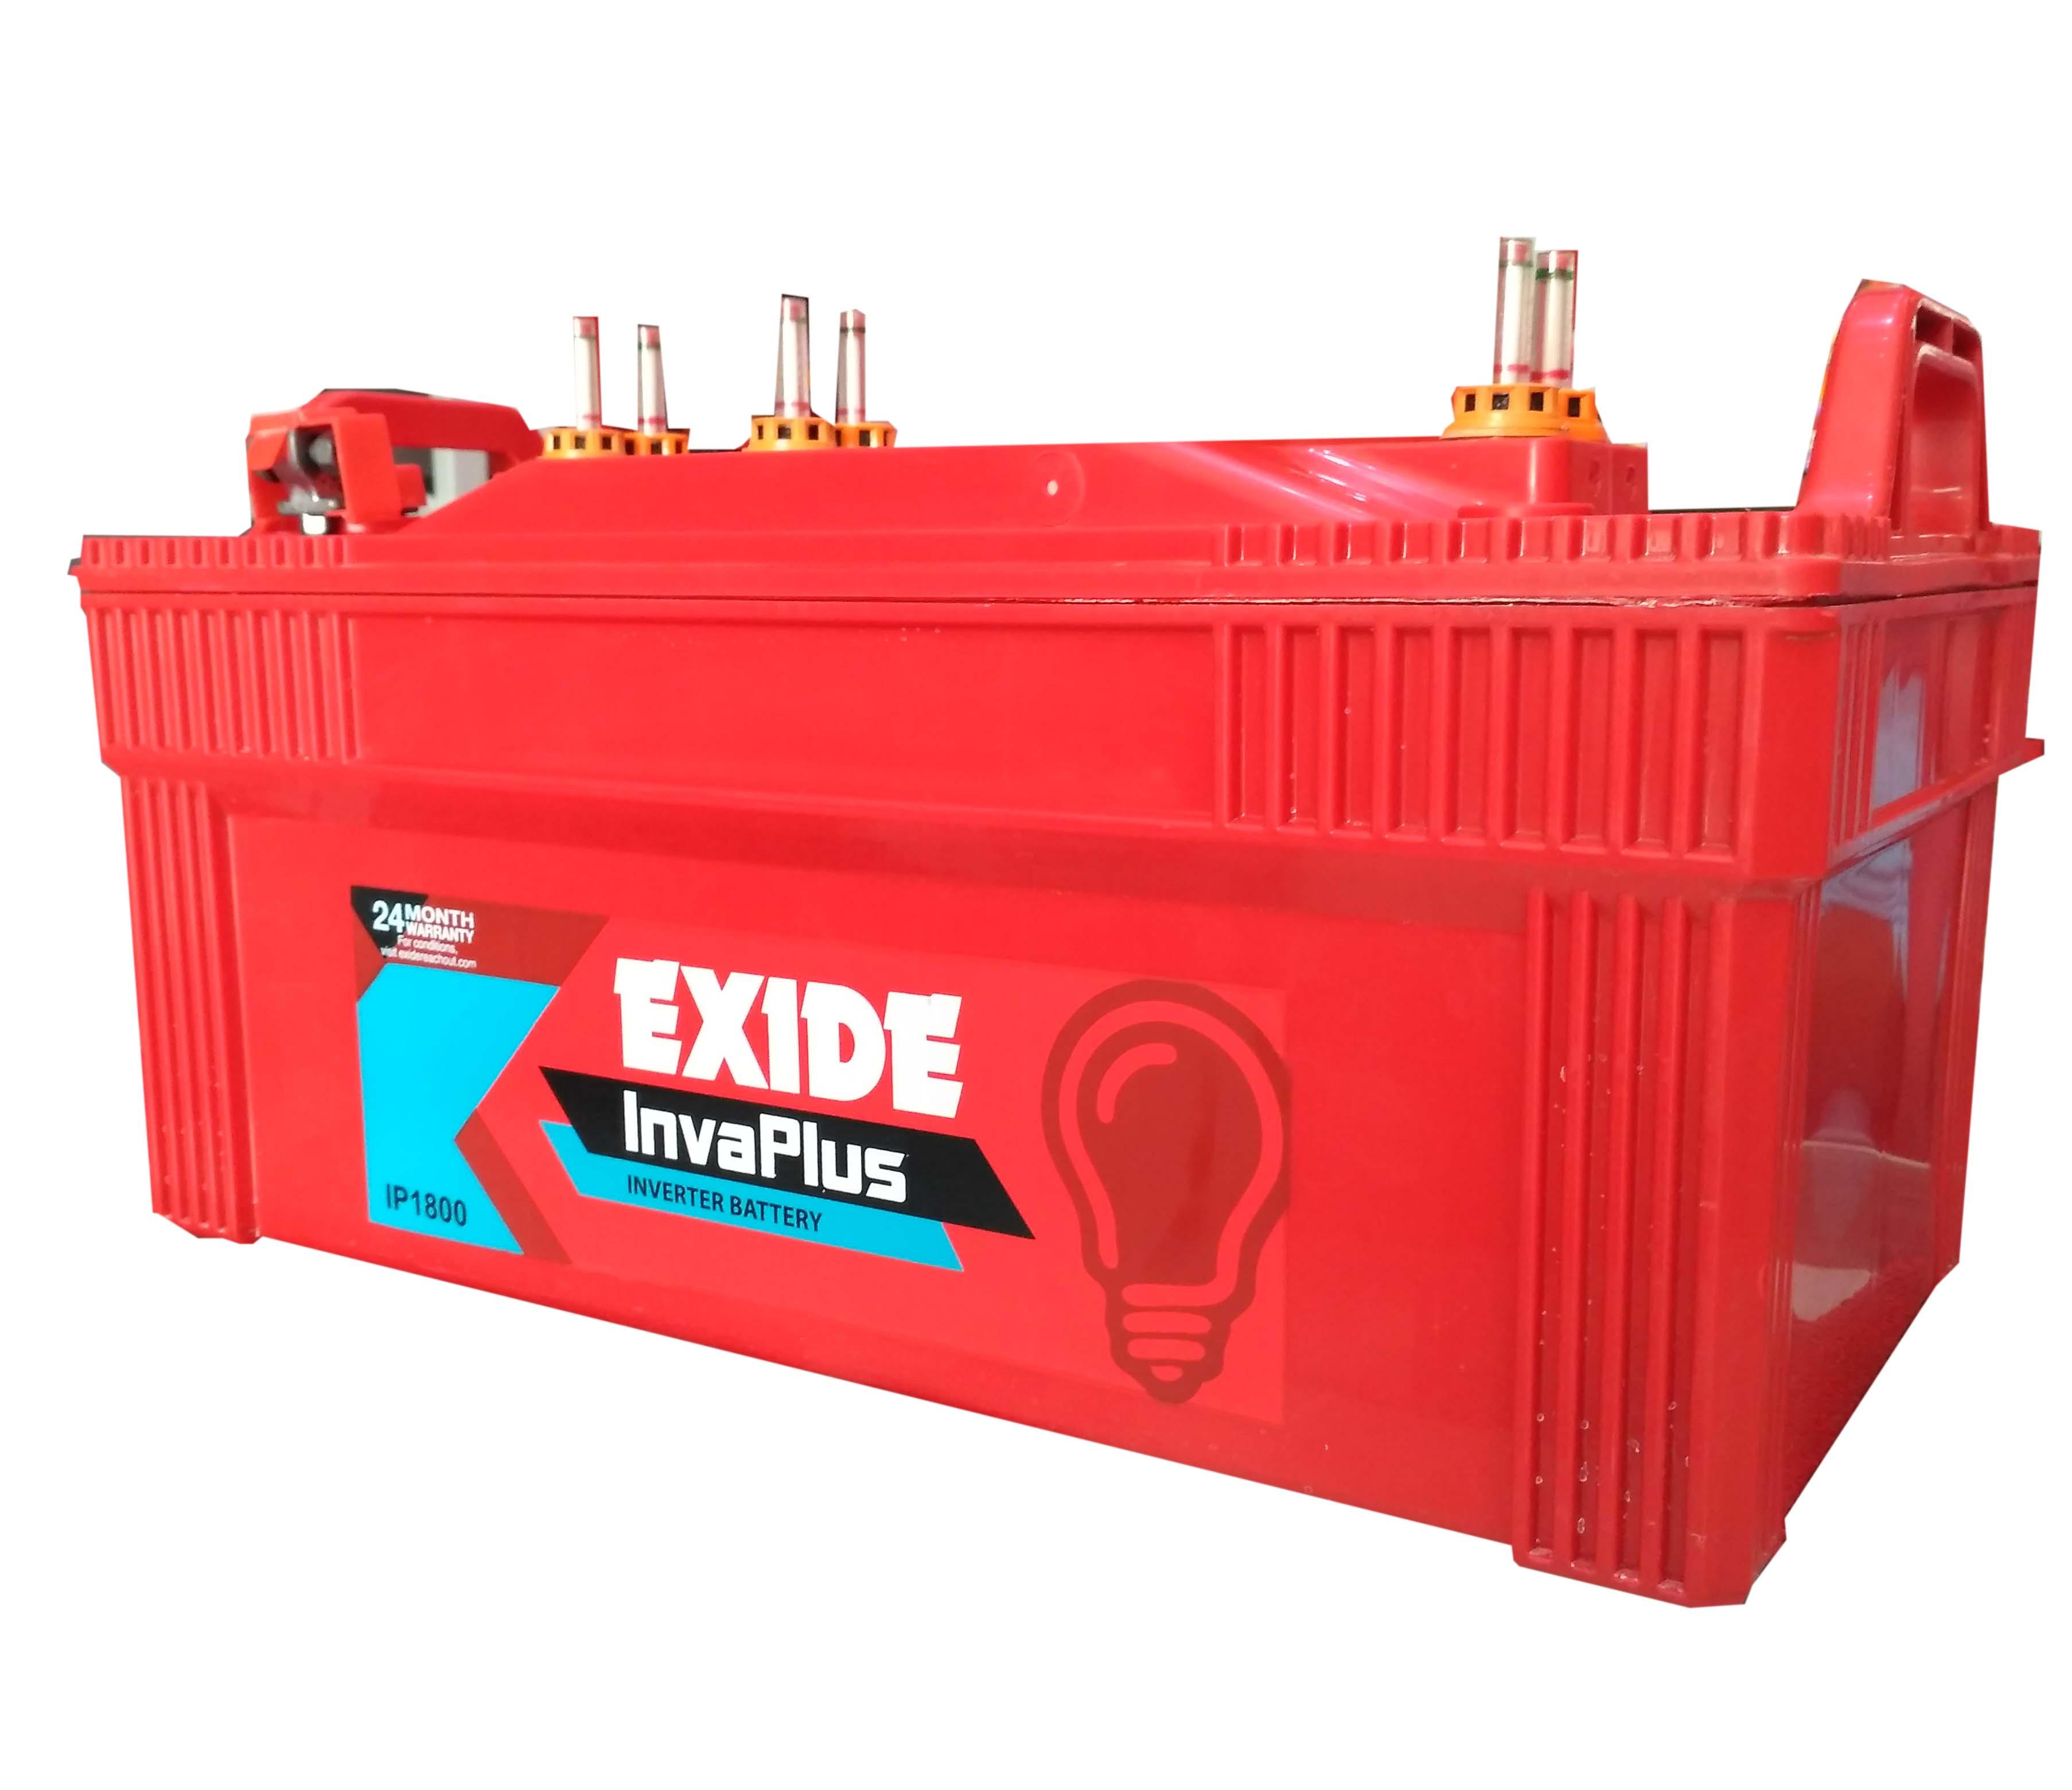 Exide Inverter battery 180 ah